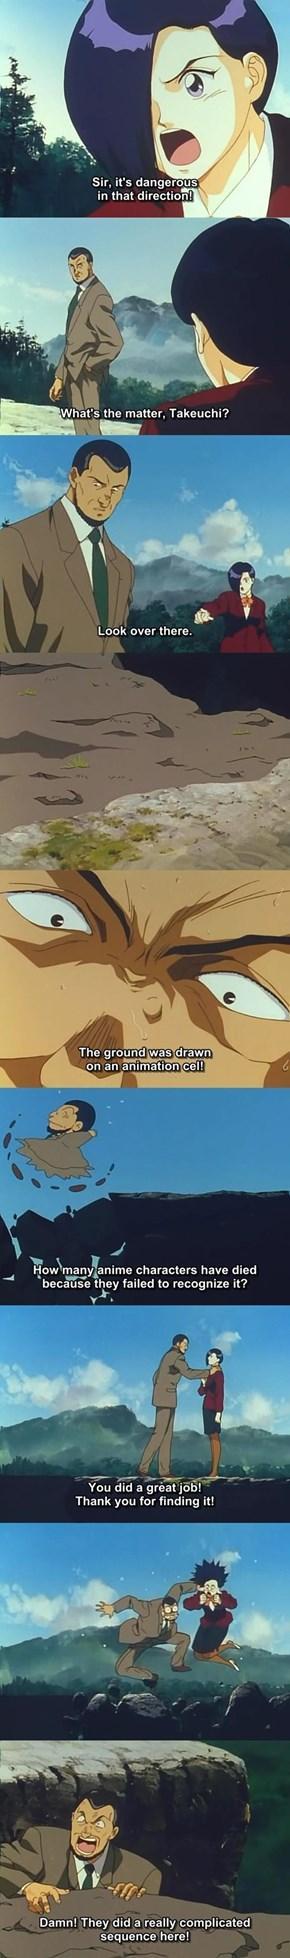 Those Unforgiveable Animators